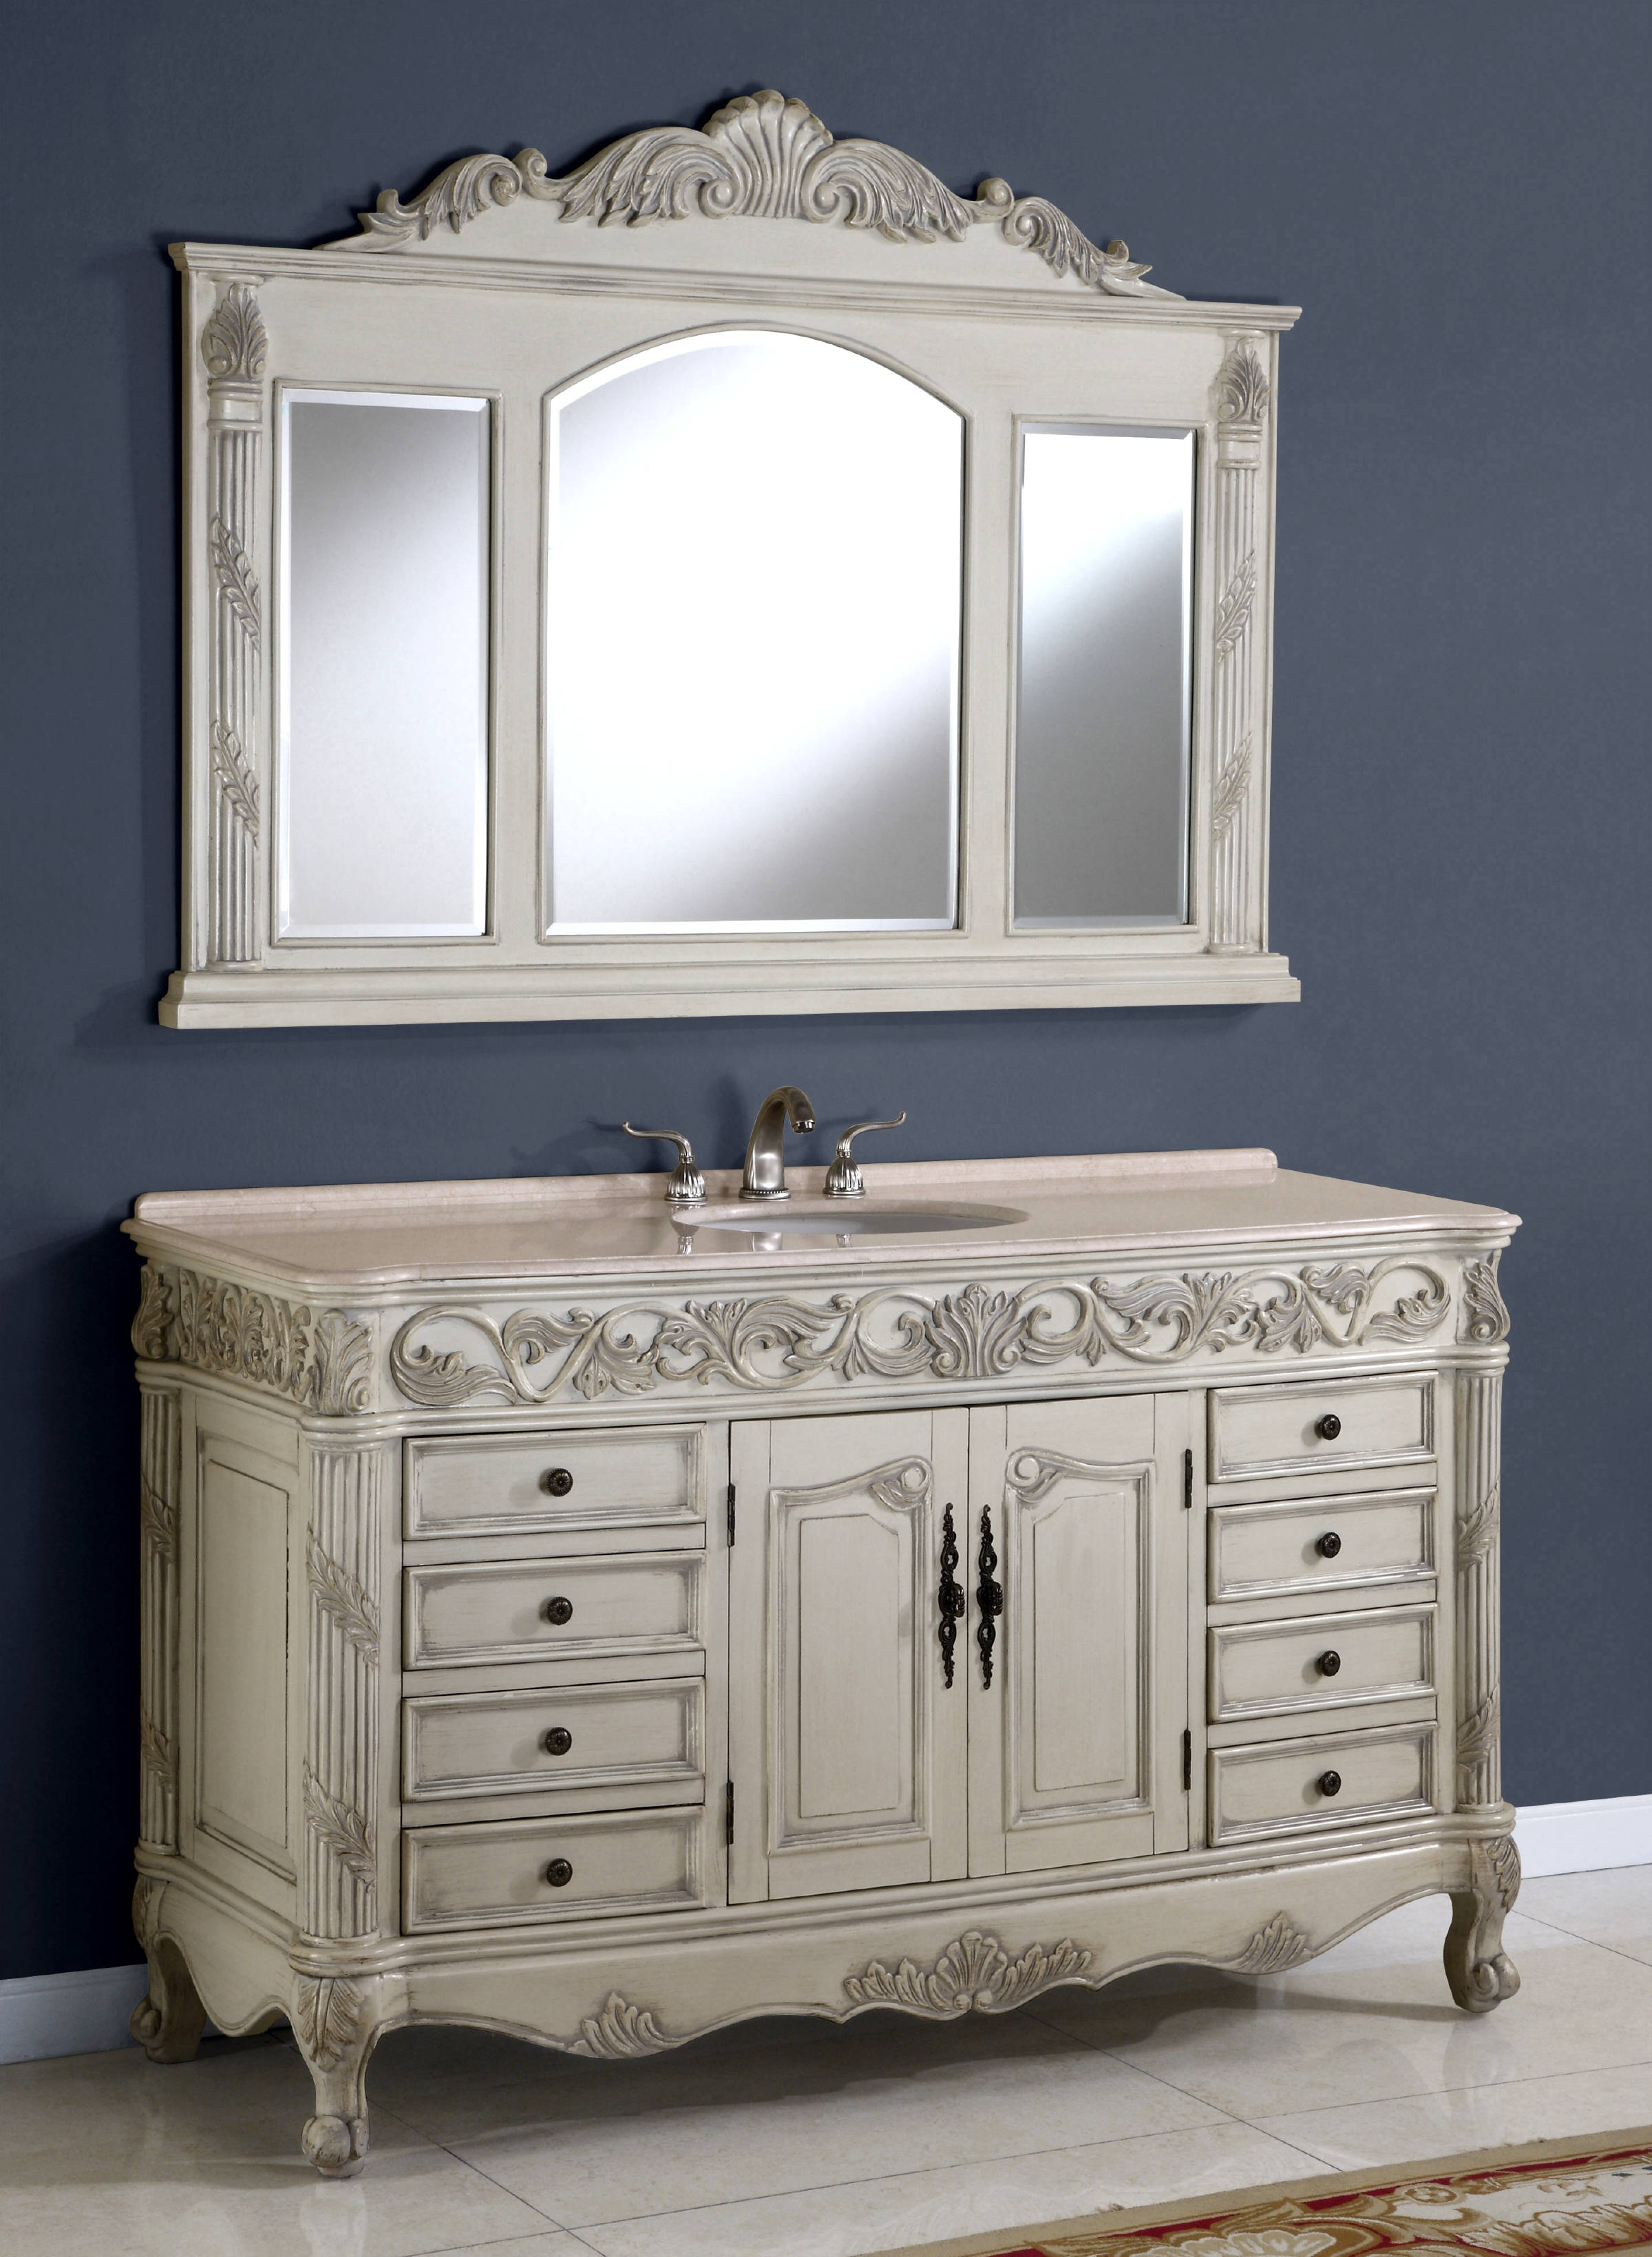 60 Inch Regent Vanity Single Sink Vanity Vanity With